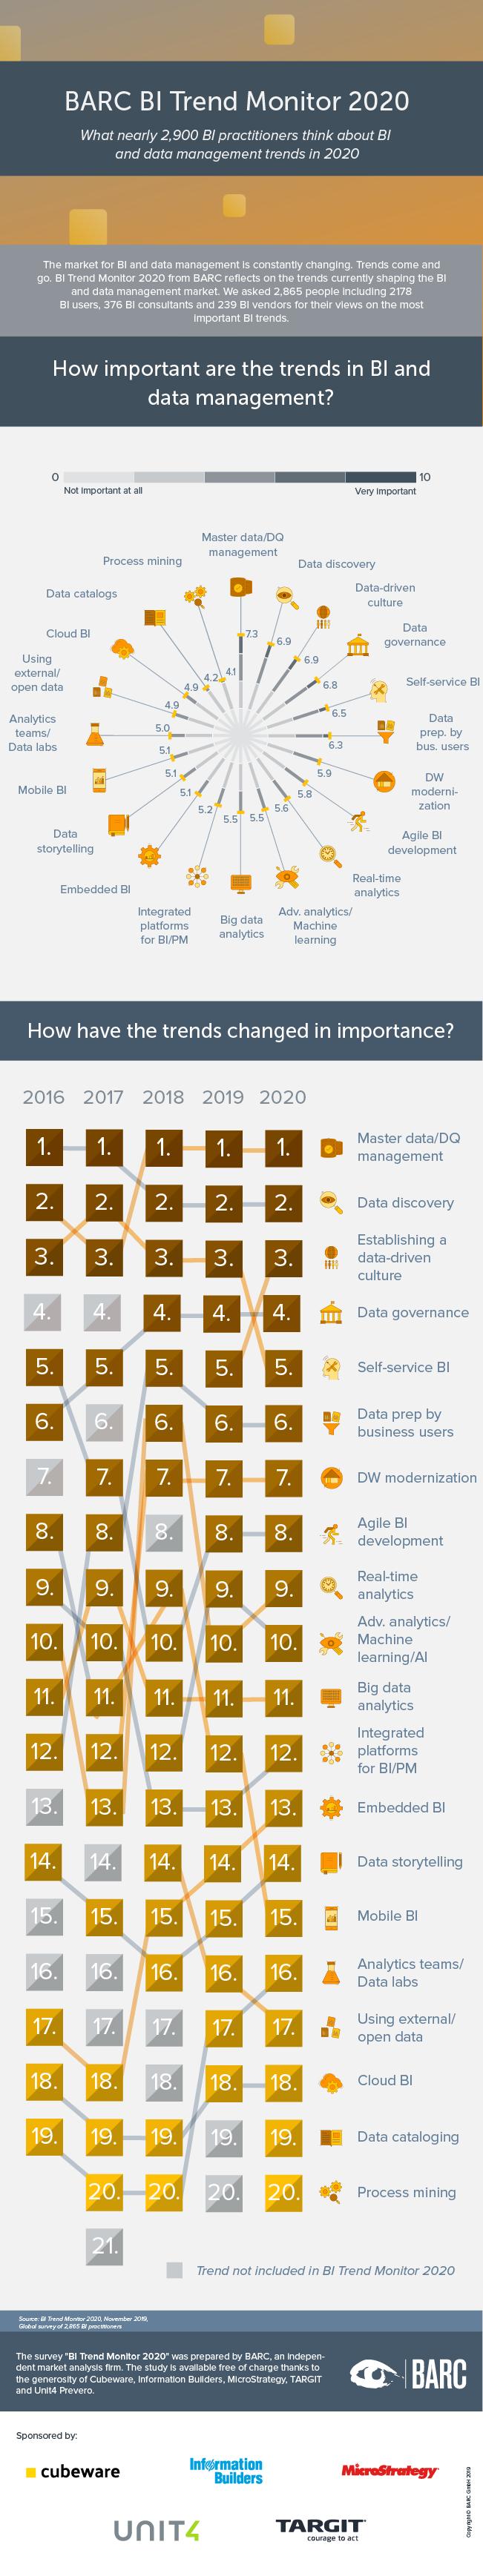 BI Trend Monitor 2020 infographic